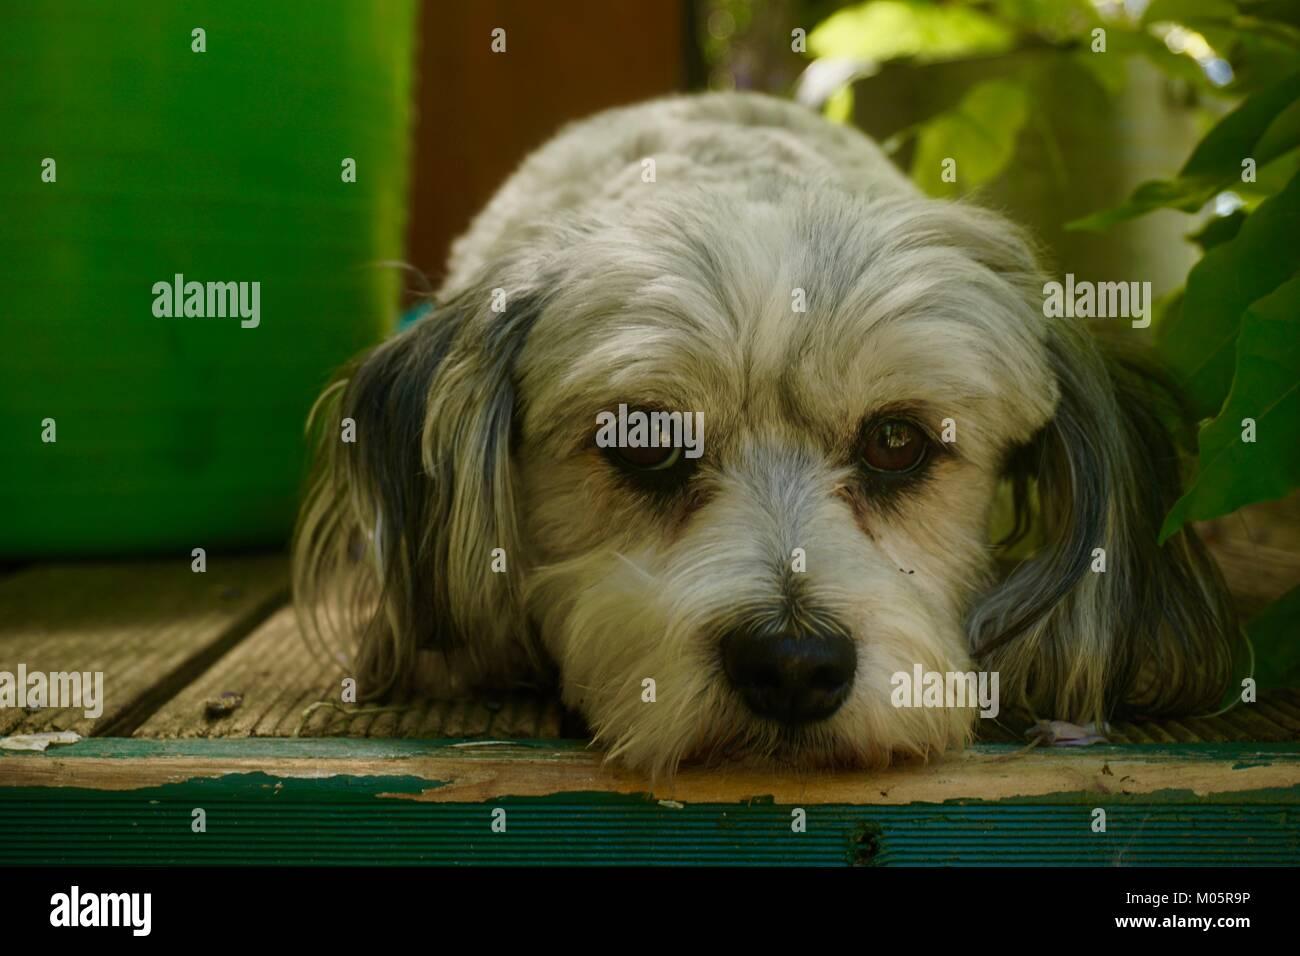 Small watch dog - Stock Image